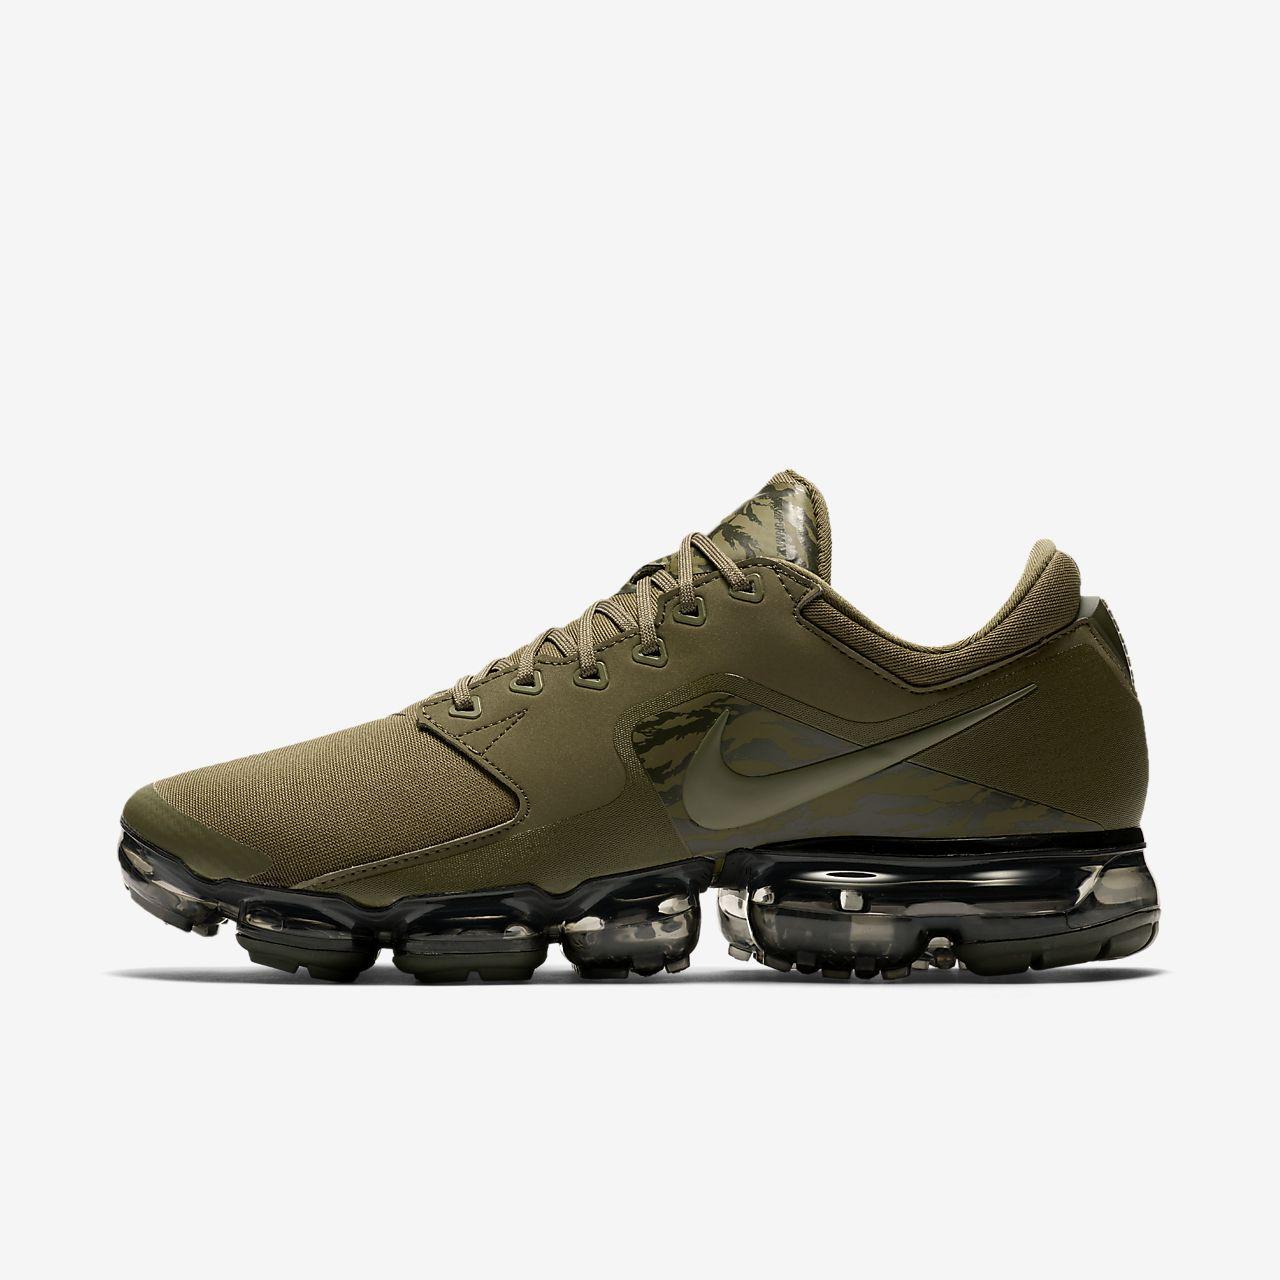 Chaussure de running Nike Air VaporMax pour Homme